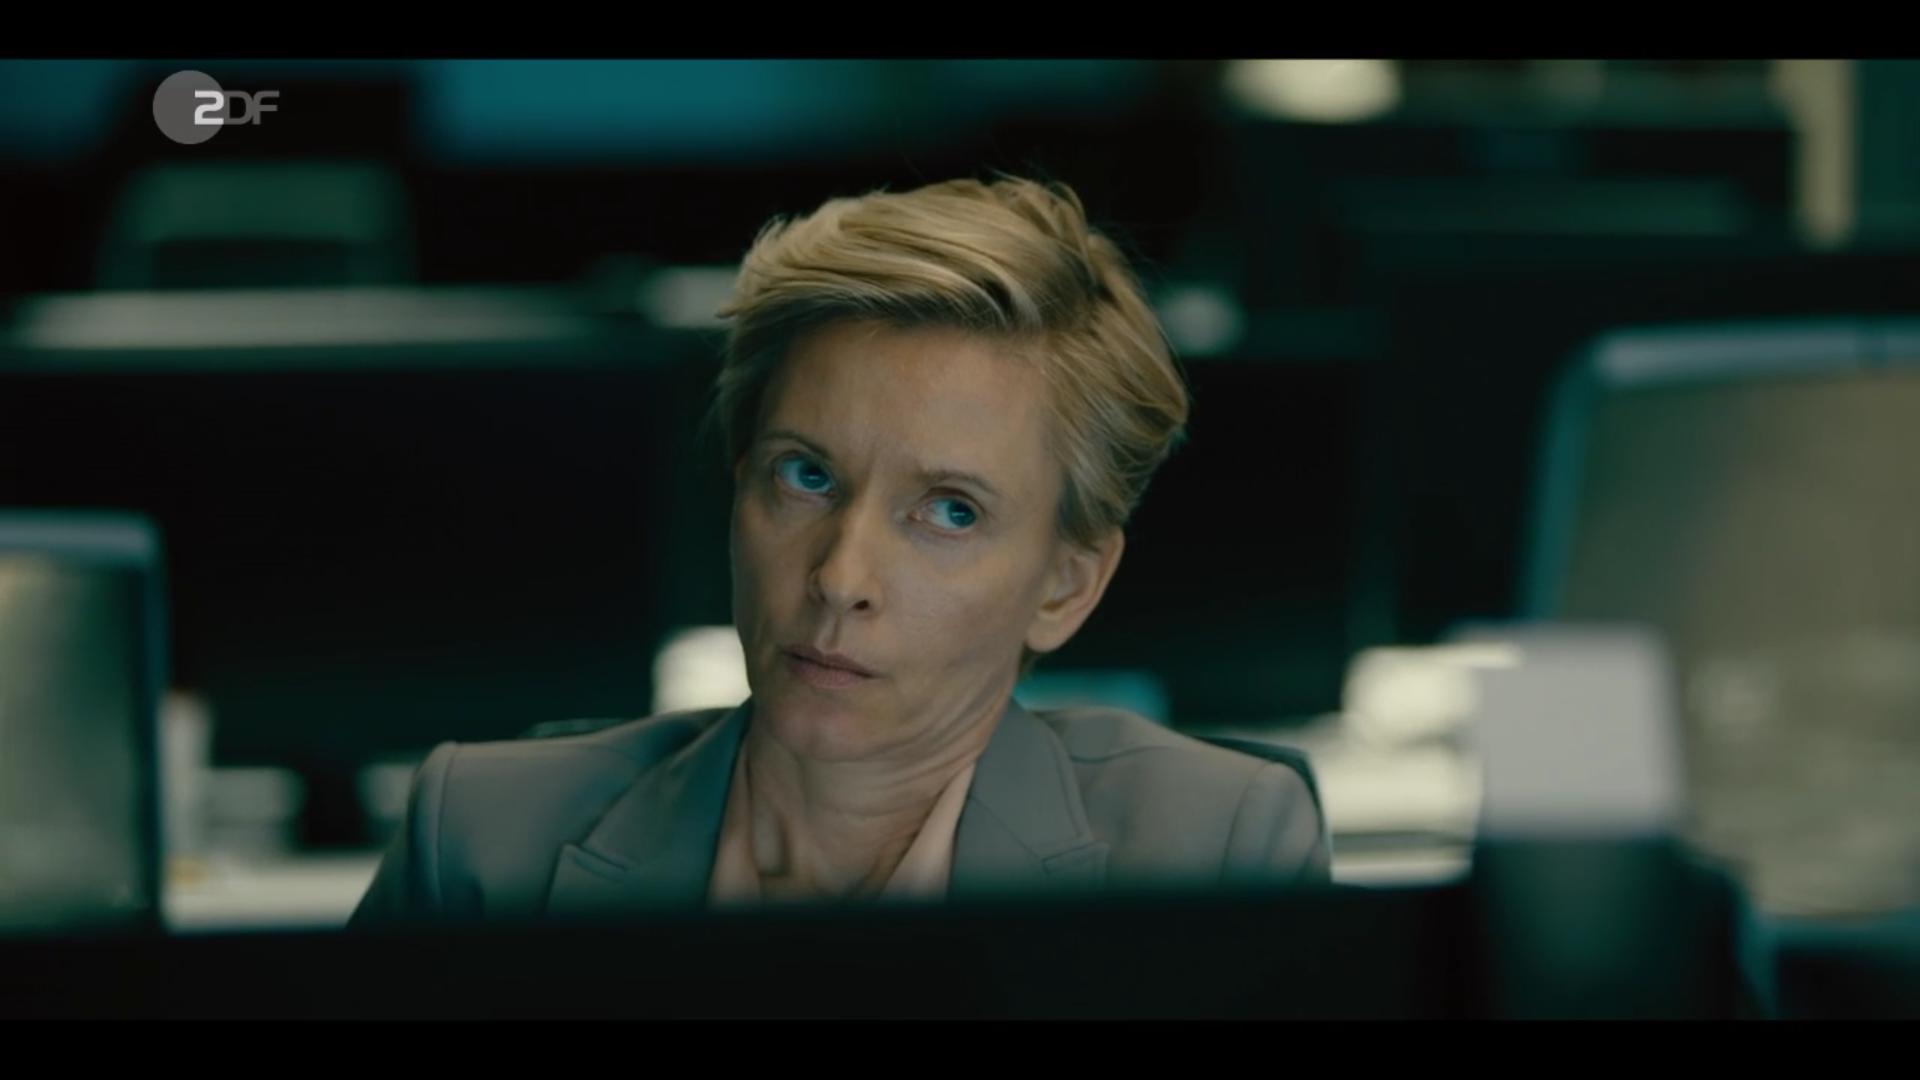 screen shot 'Bad Banks' season 1, 1